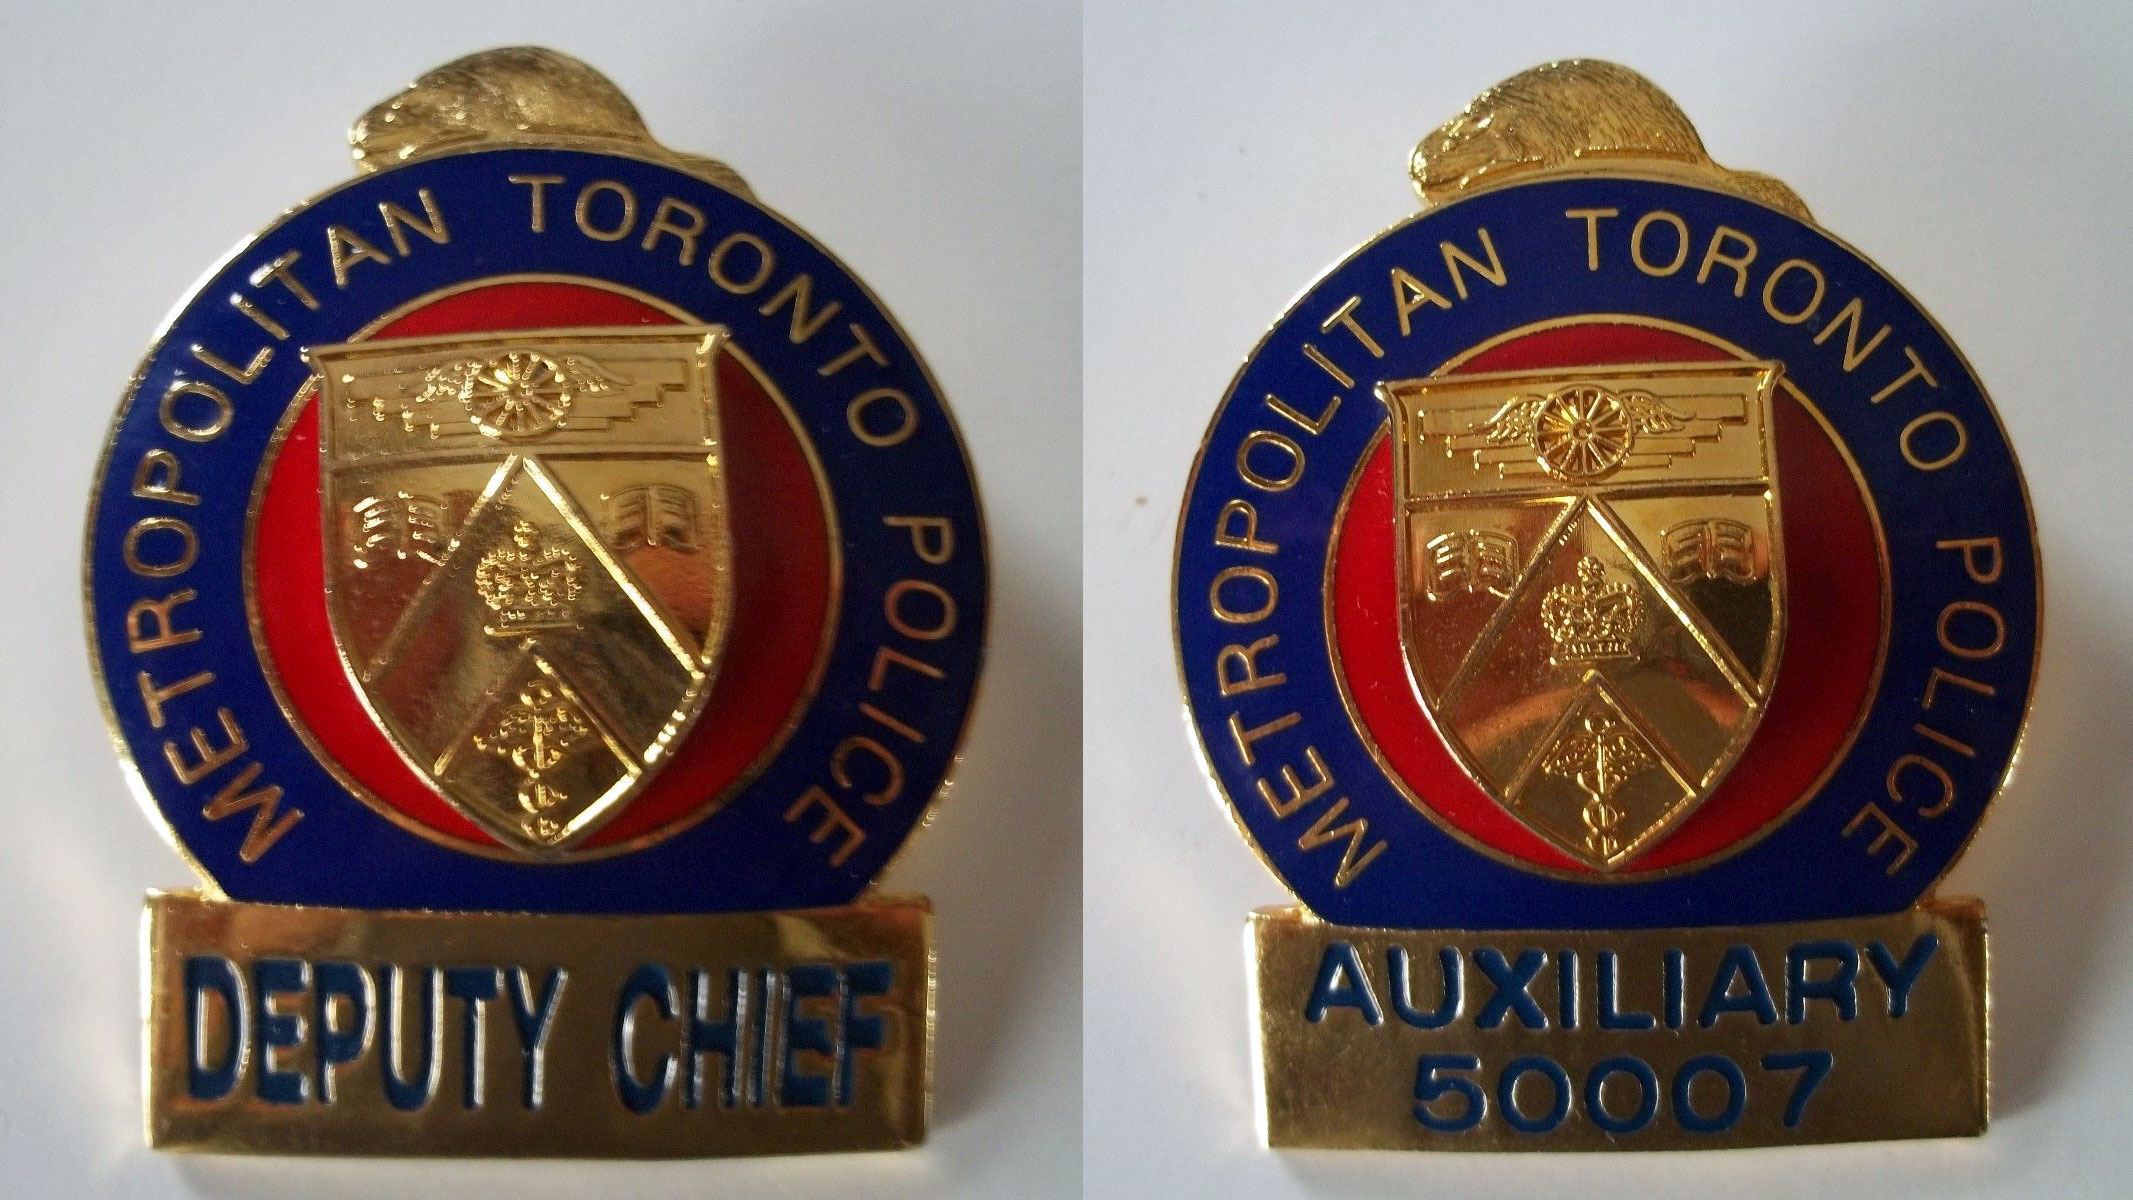 Metropolitan Toronto Police badges for sale on eBay. EBAY